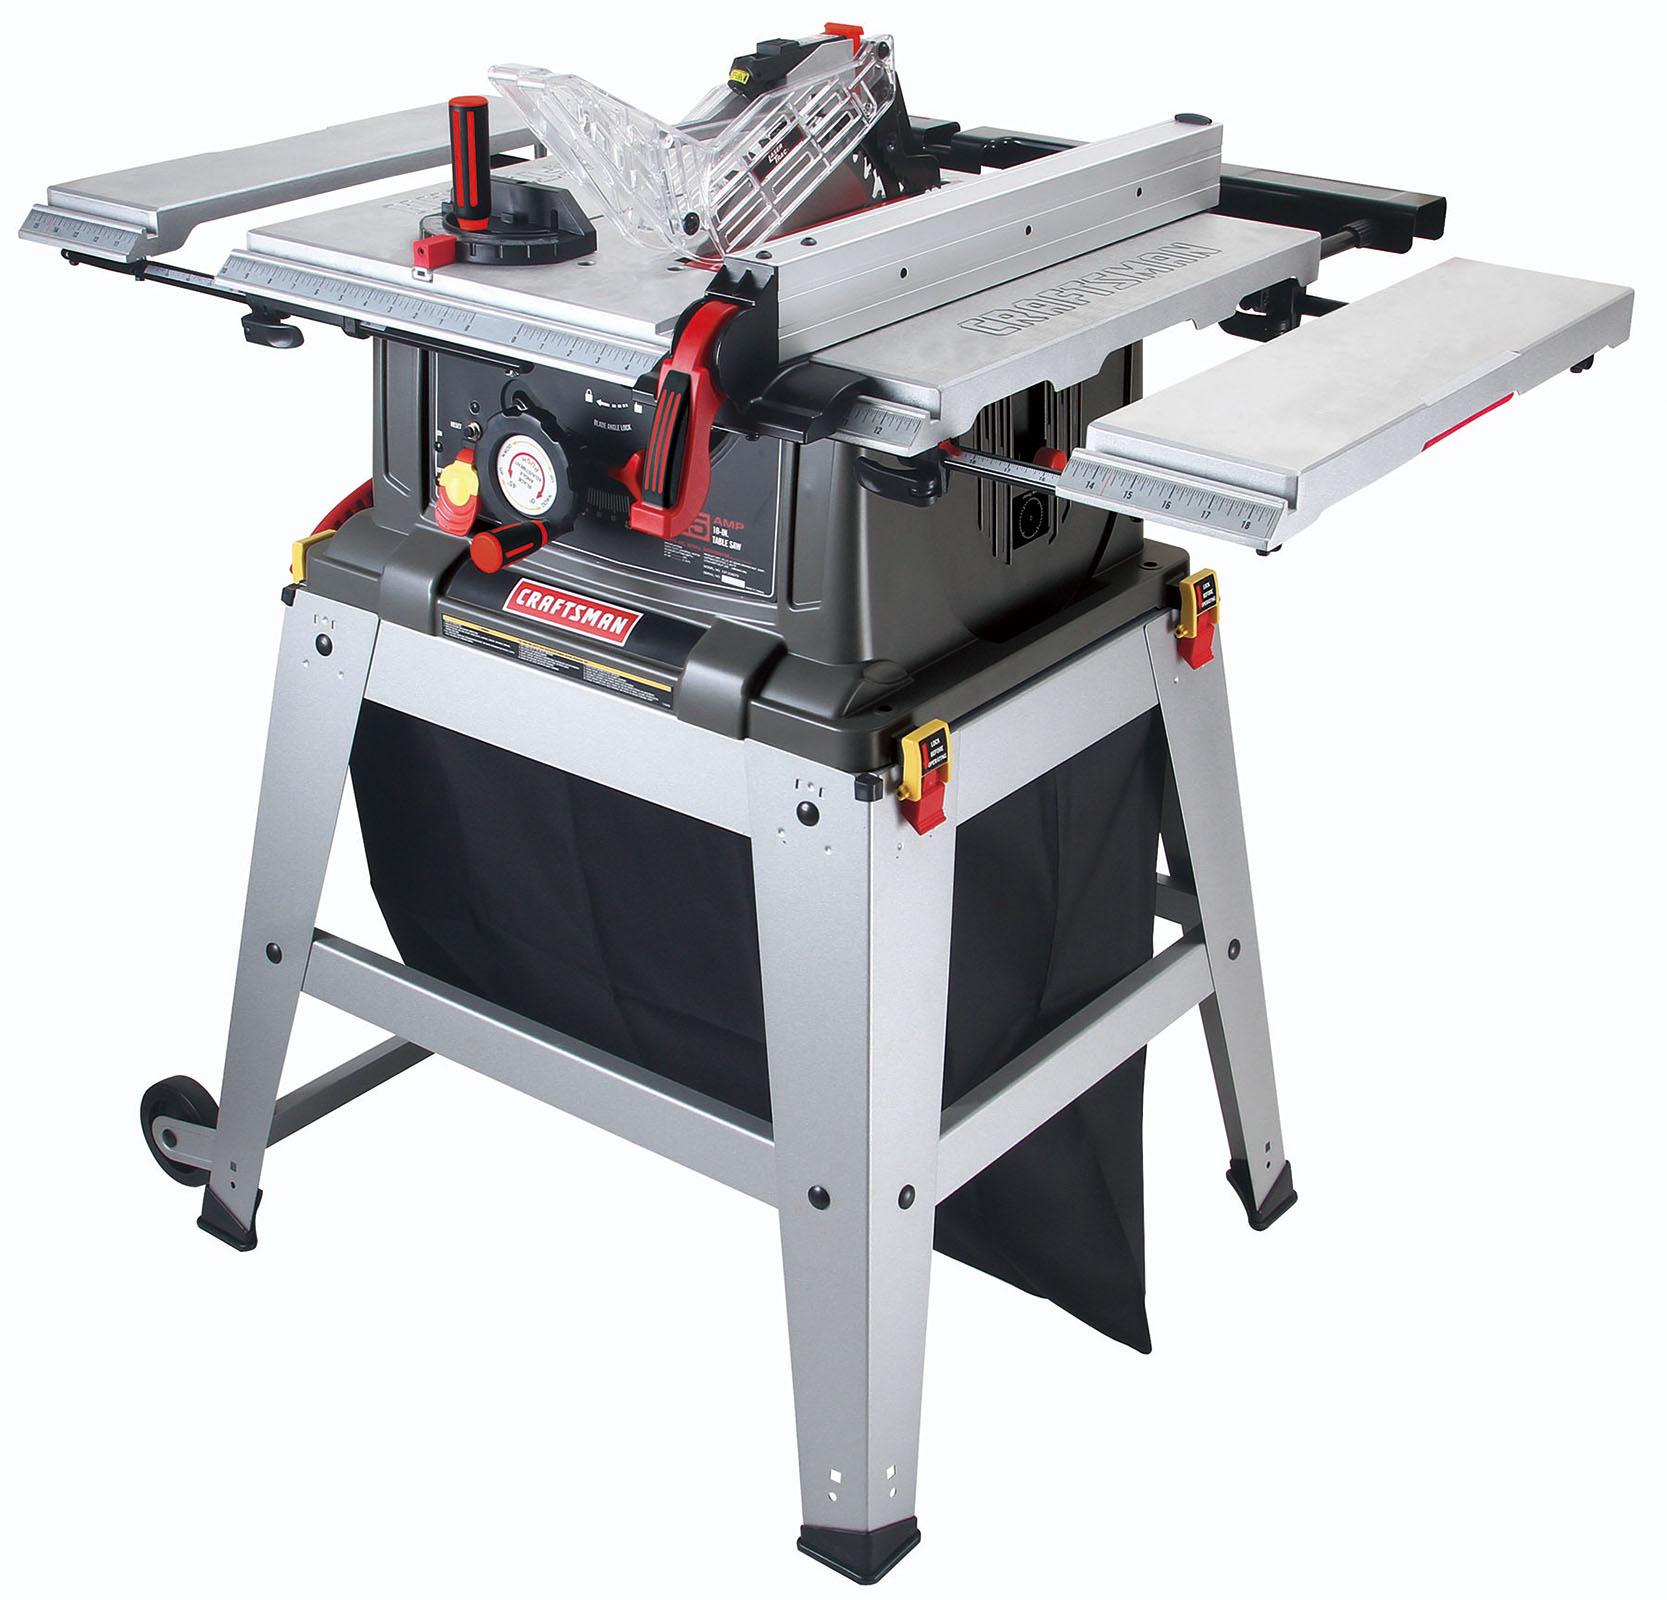 medium resolution of prod 1565359712 wid 200 hei 250 craftsman table saw parts model 137218073